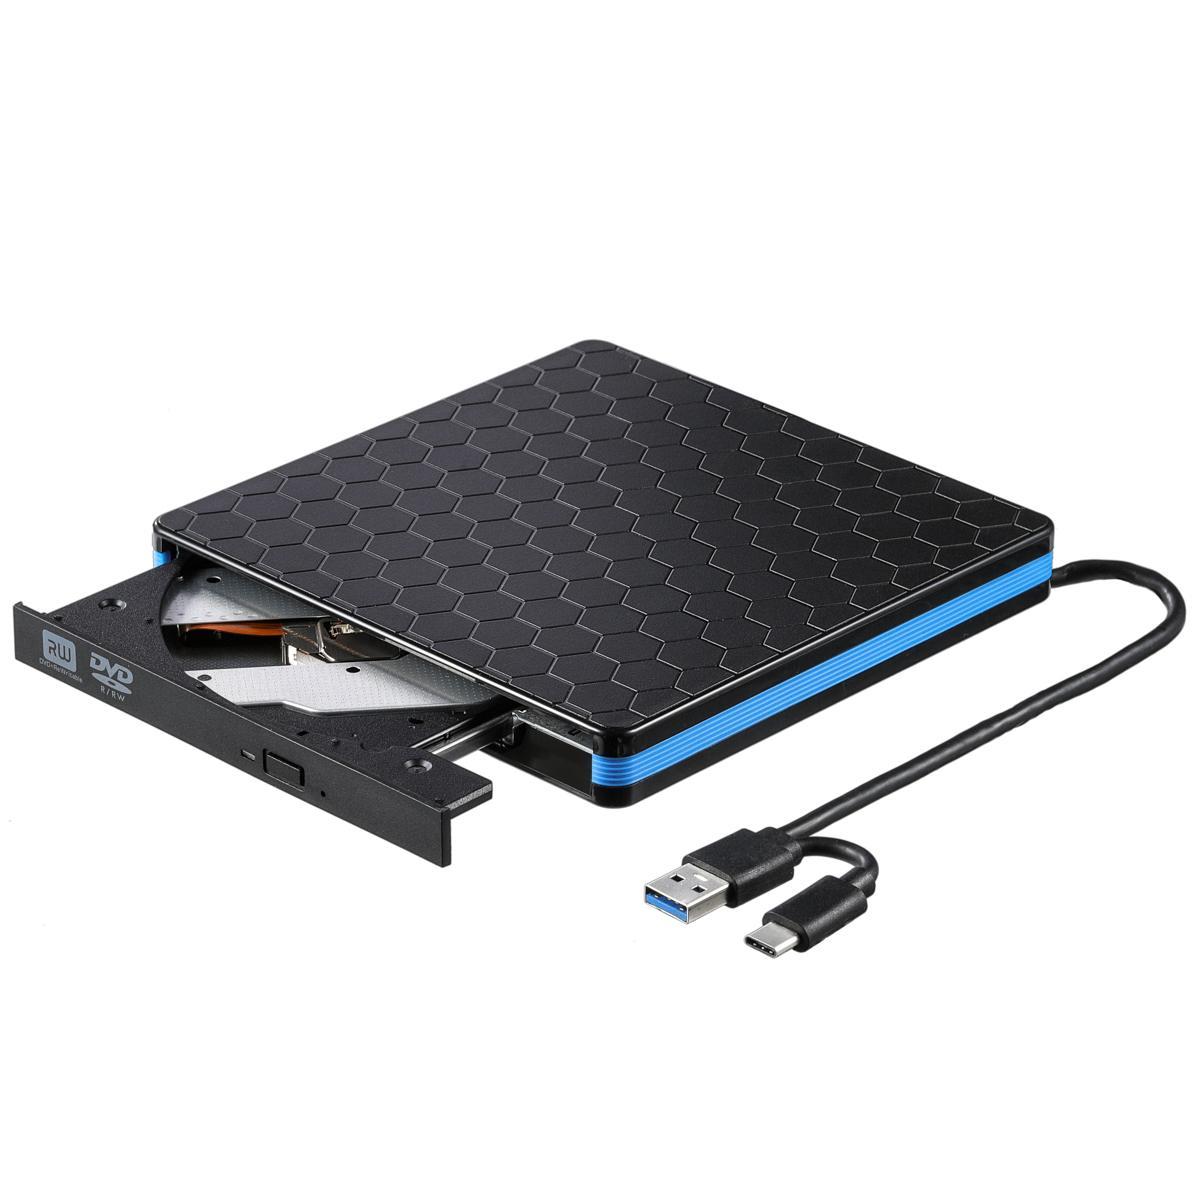 Universal Type C USB 3.0 External DVD/CD/ VCD Burner RW SVCD Drive Player Optical Drive for Mac/PC/Apple Laptop/OS/Windows